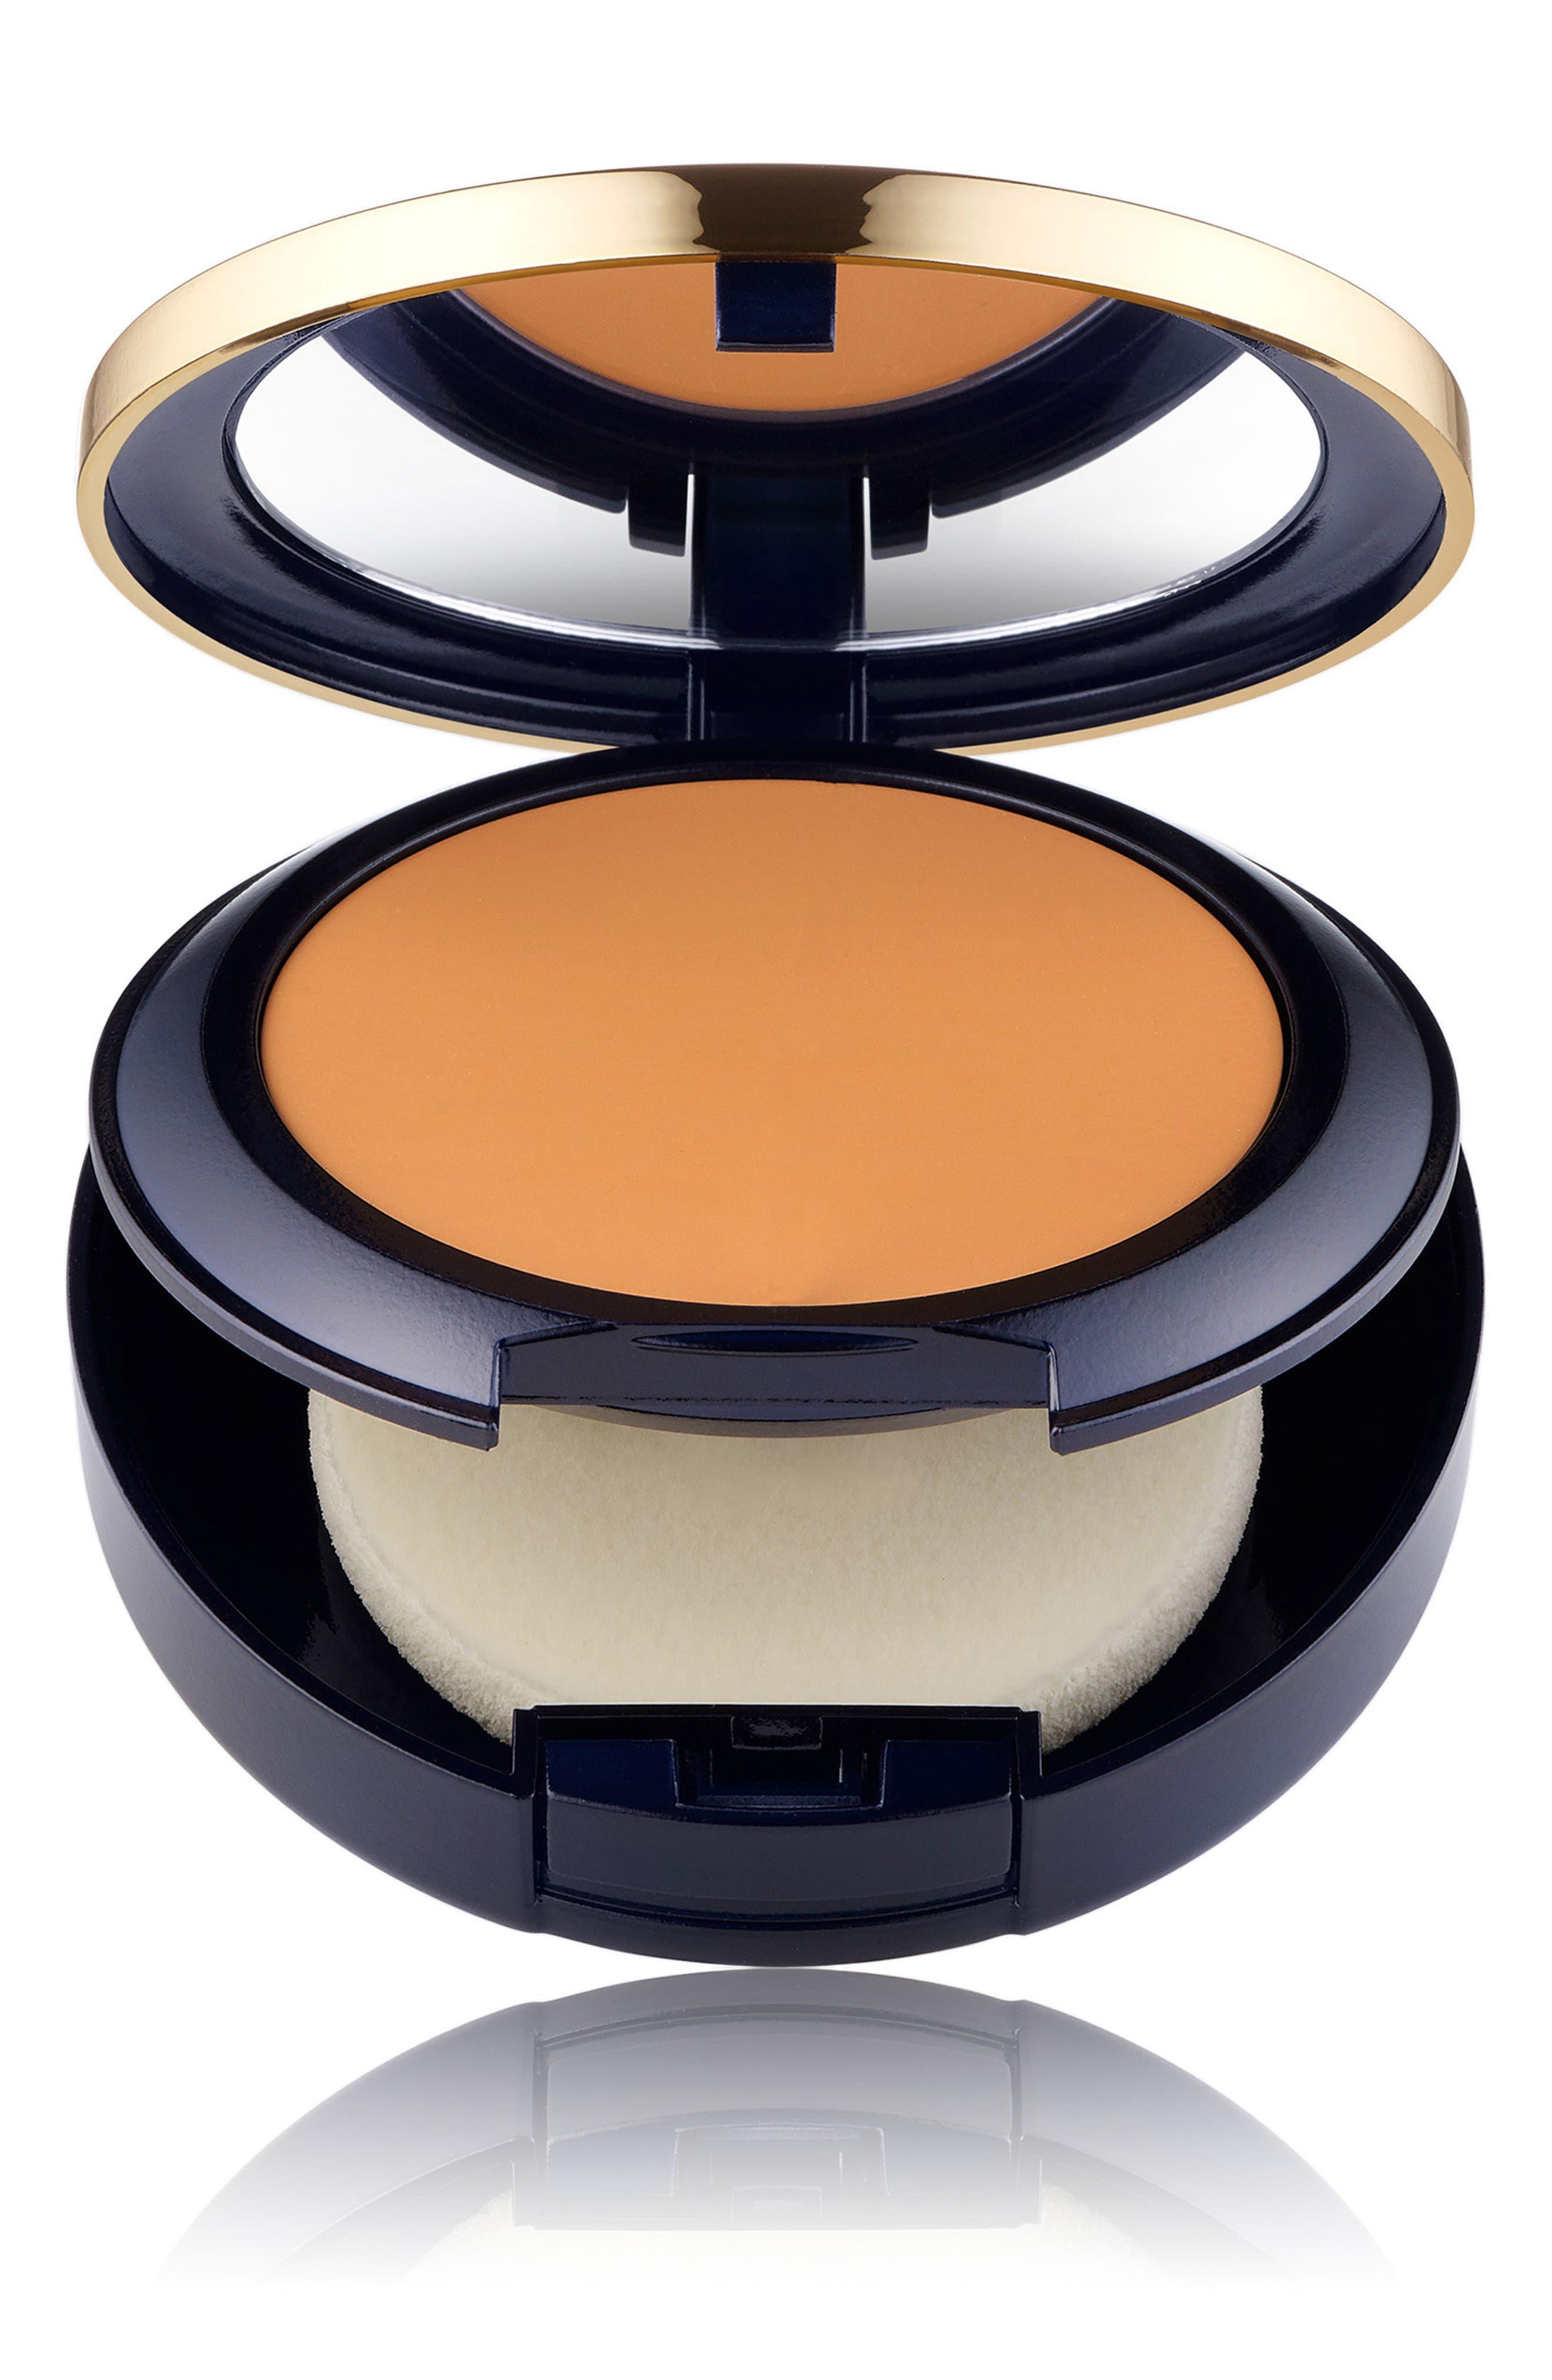 Estee Lauder Double Wear Stay In Place Matte Powder Foundation - 5N2 Amber Honey